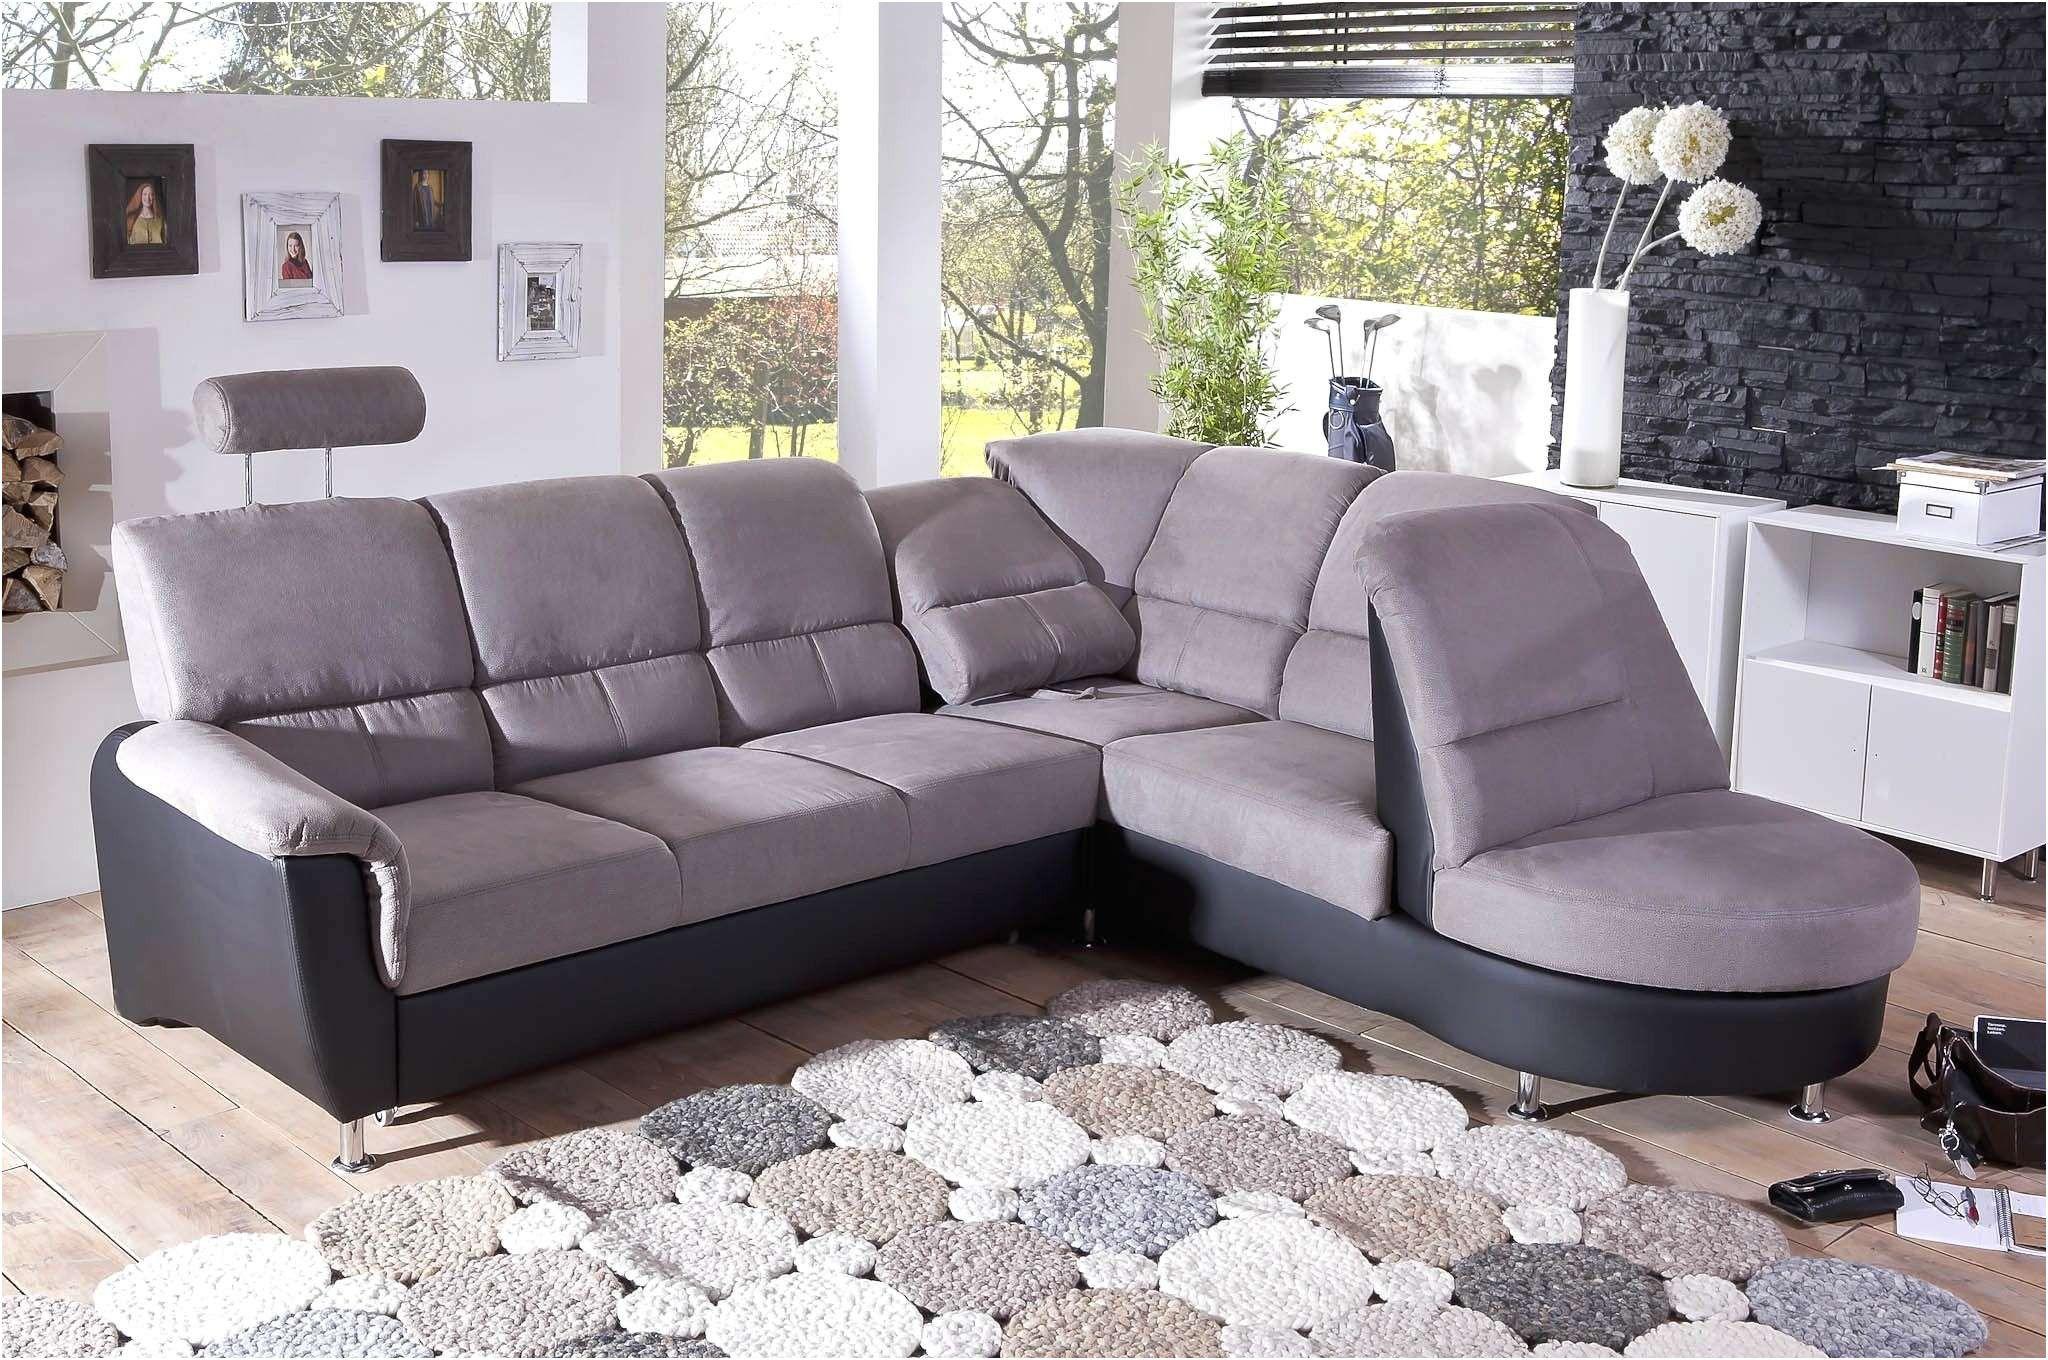 Kreativ Stylische Sofas Check More At Https Tridentbeauties Org Stylische Sofas 2 22688